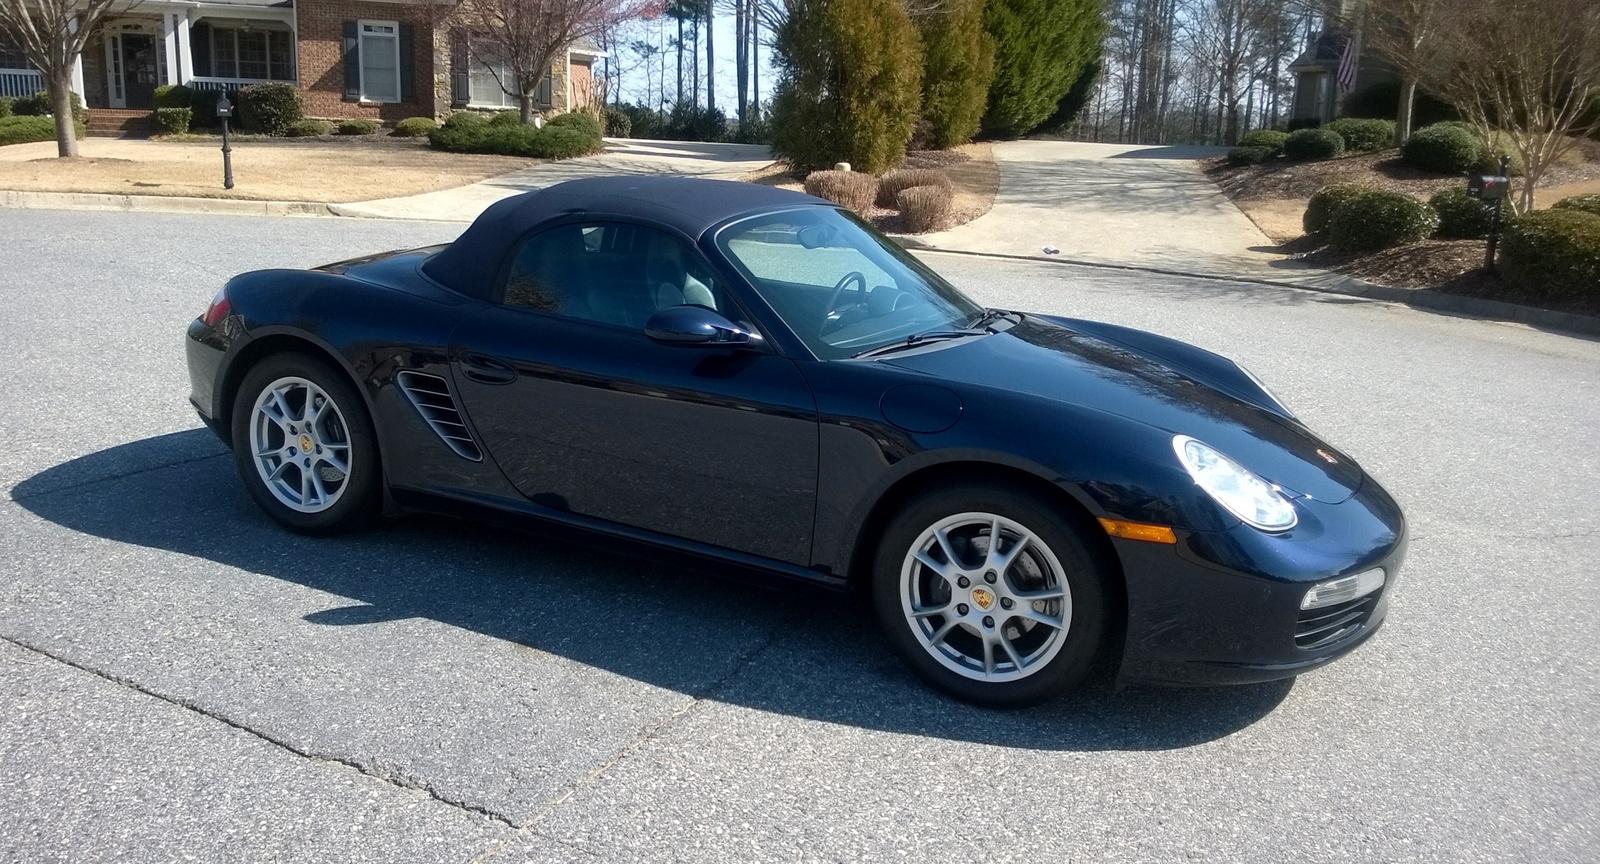 2007 Porsche Boxster - Pictures - CarGurus